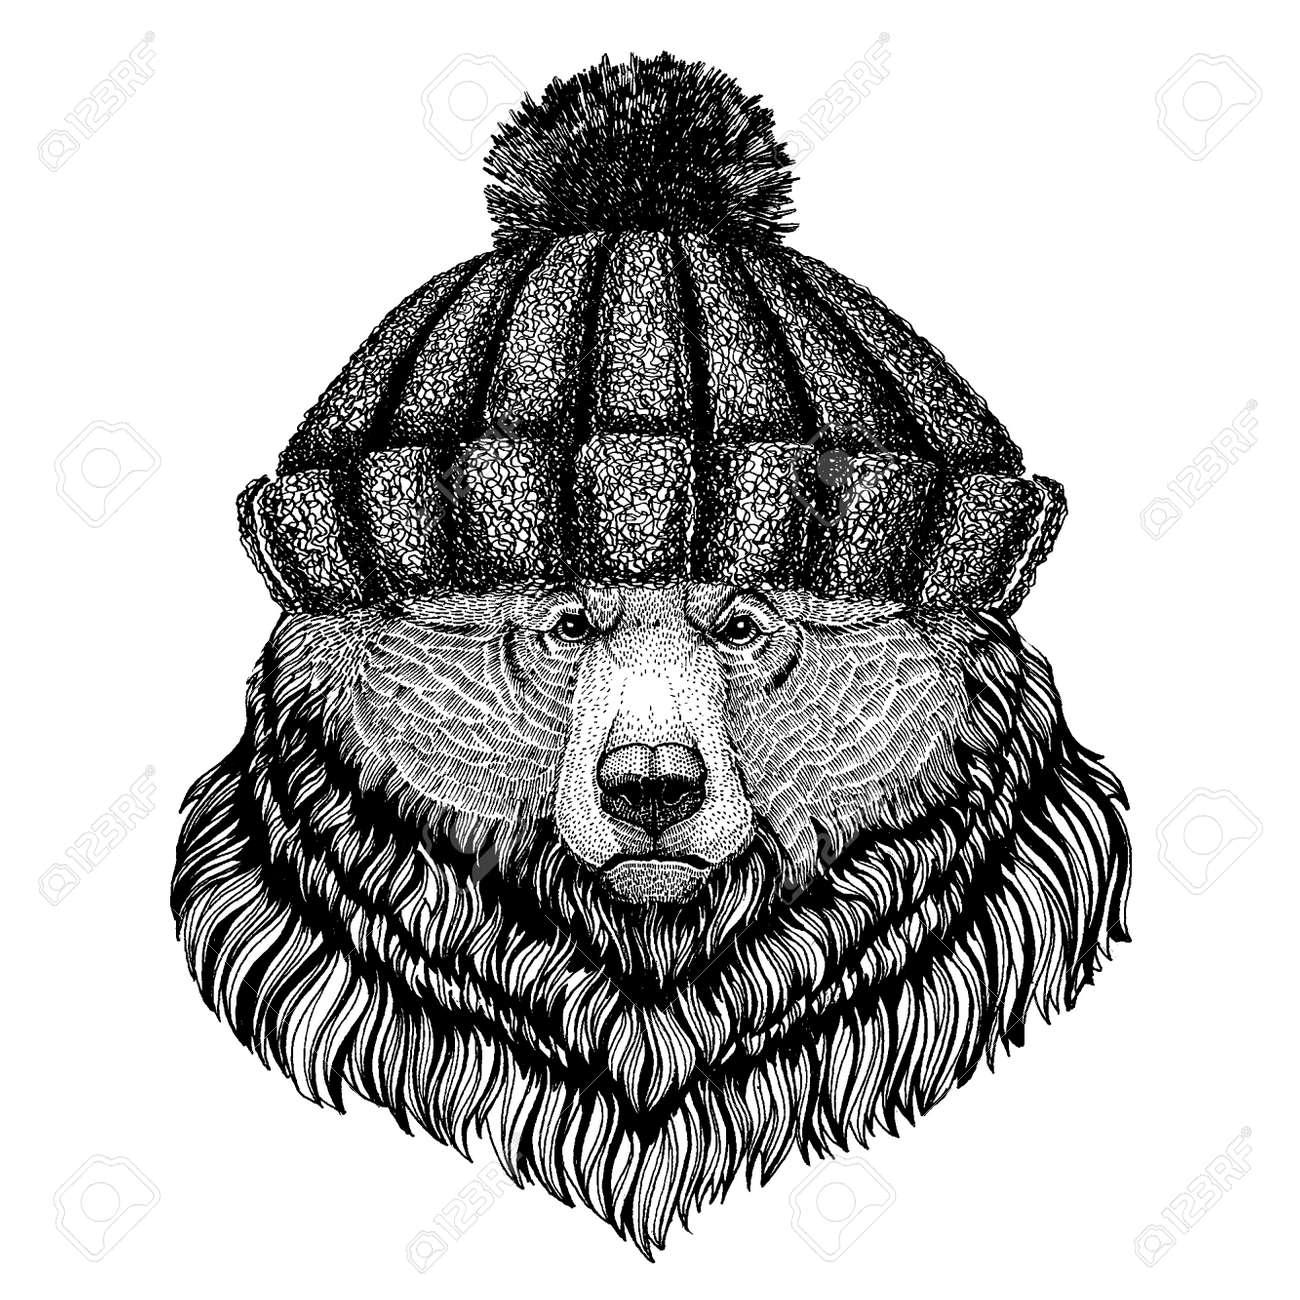 1e1ca55f168 Grizzly bear Big wild bear Cool animal wearing knitted winter hat. Warm  headdress beanie Christmas